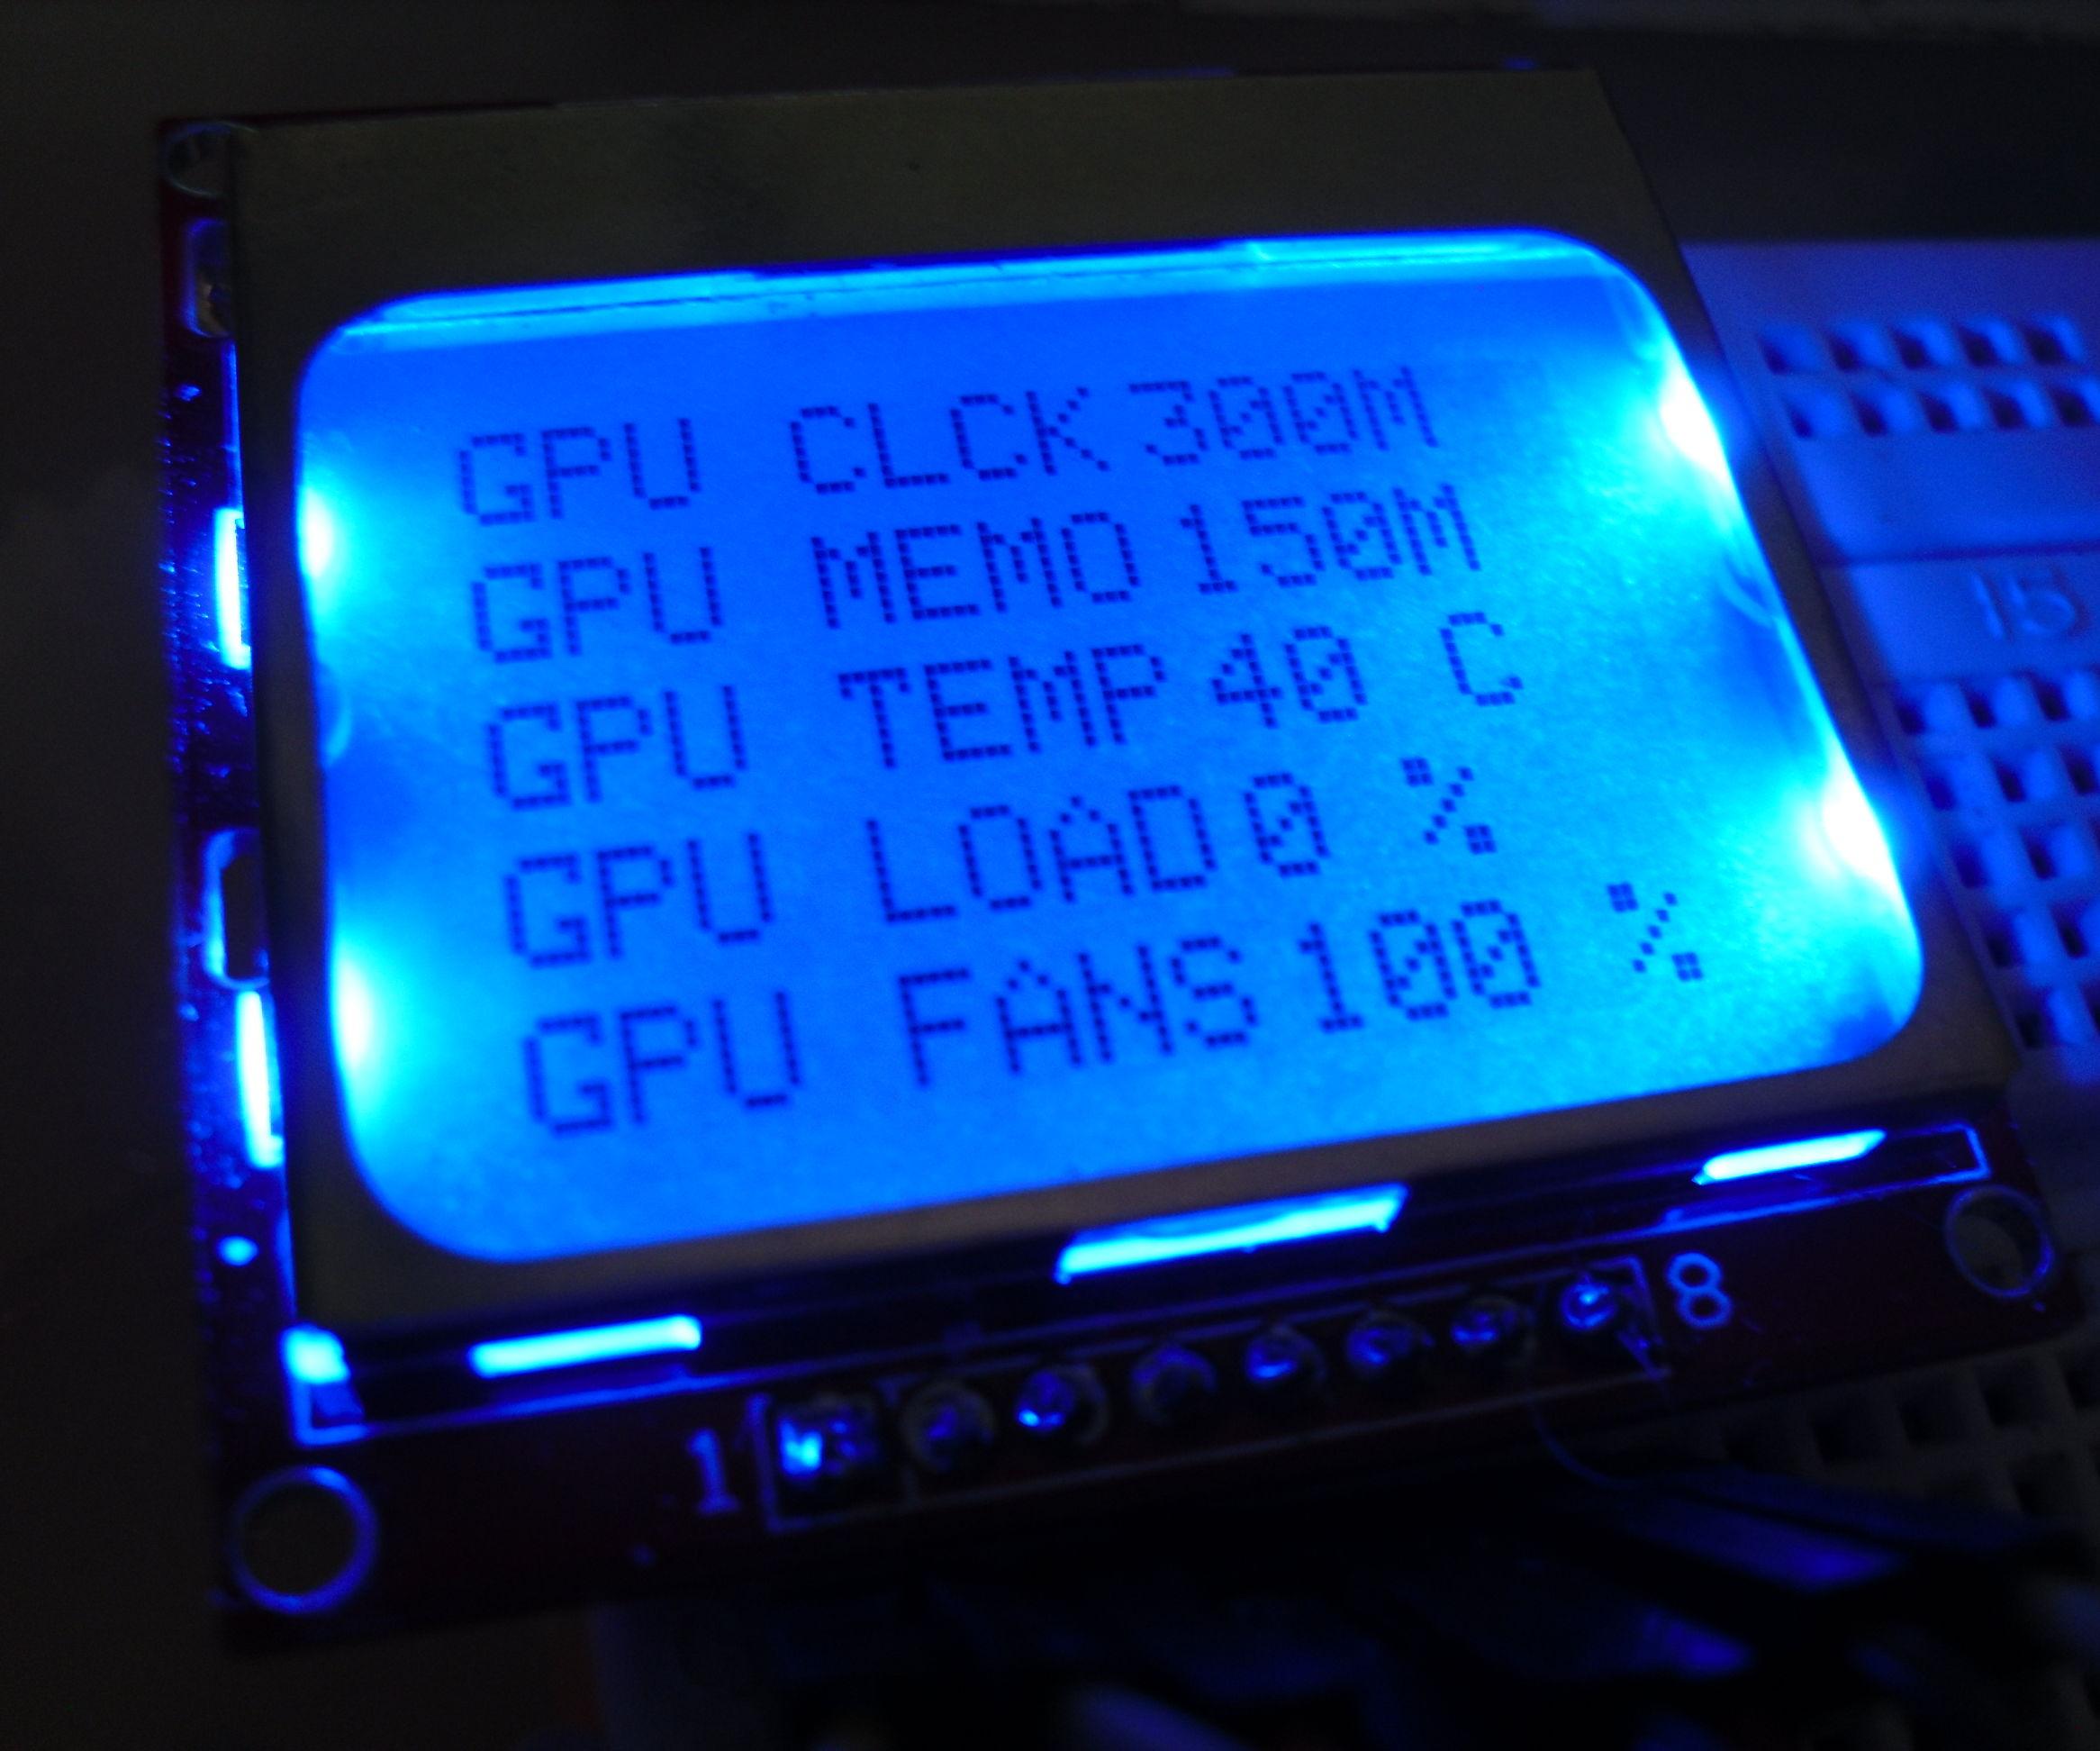 OPEN External Hardware Monitor